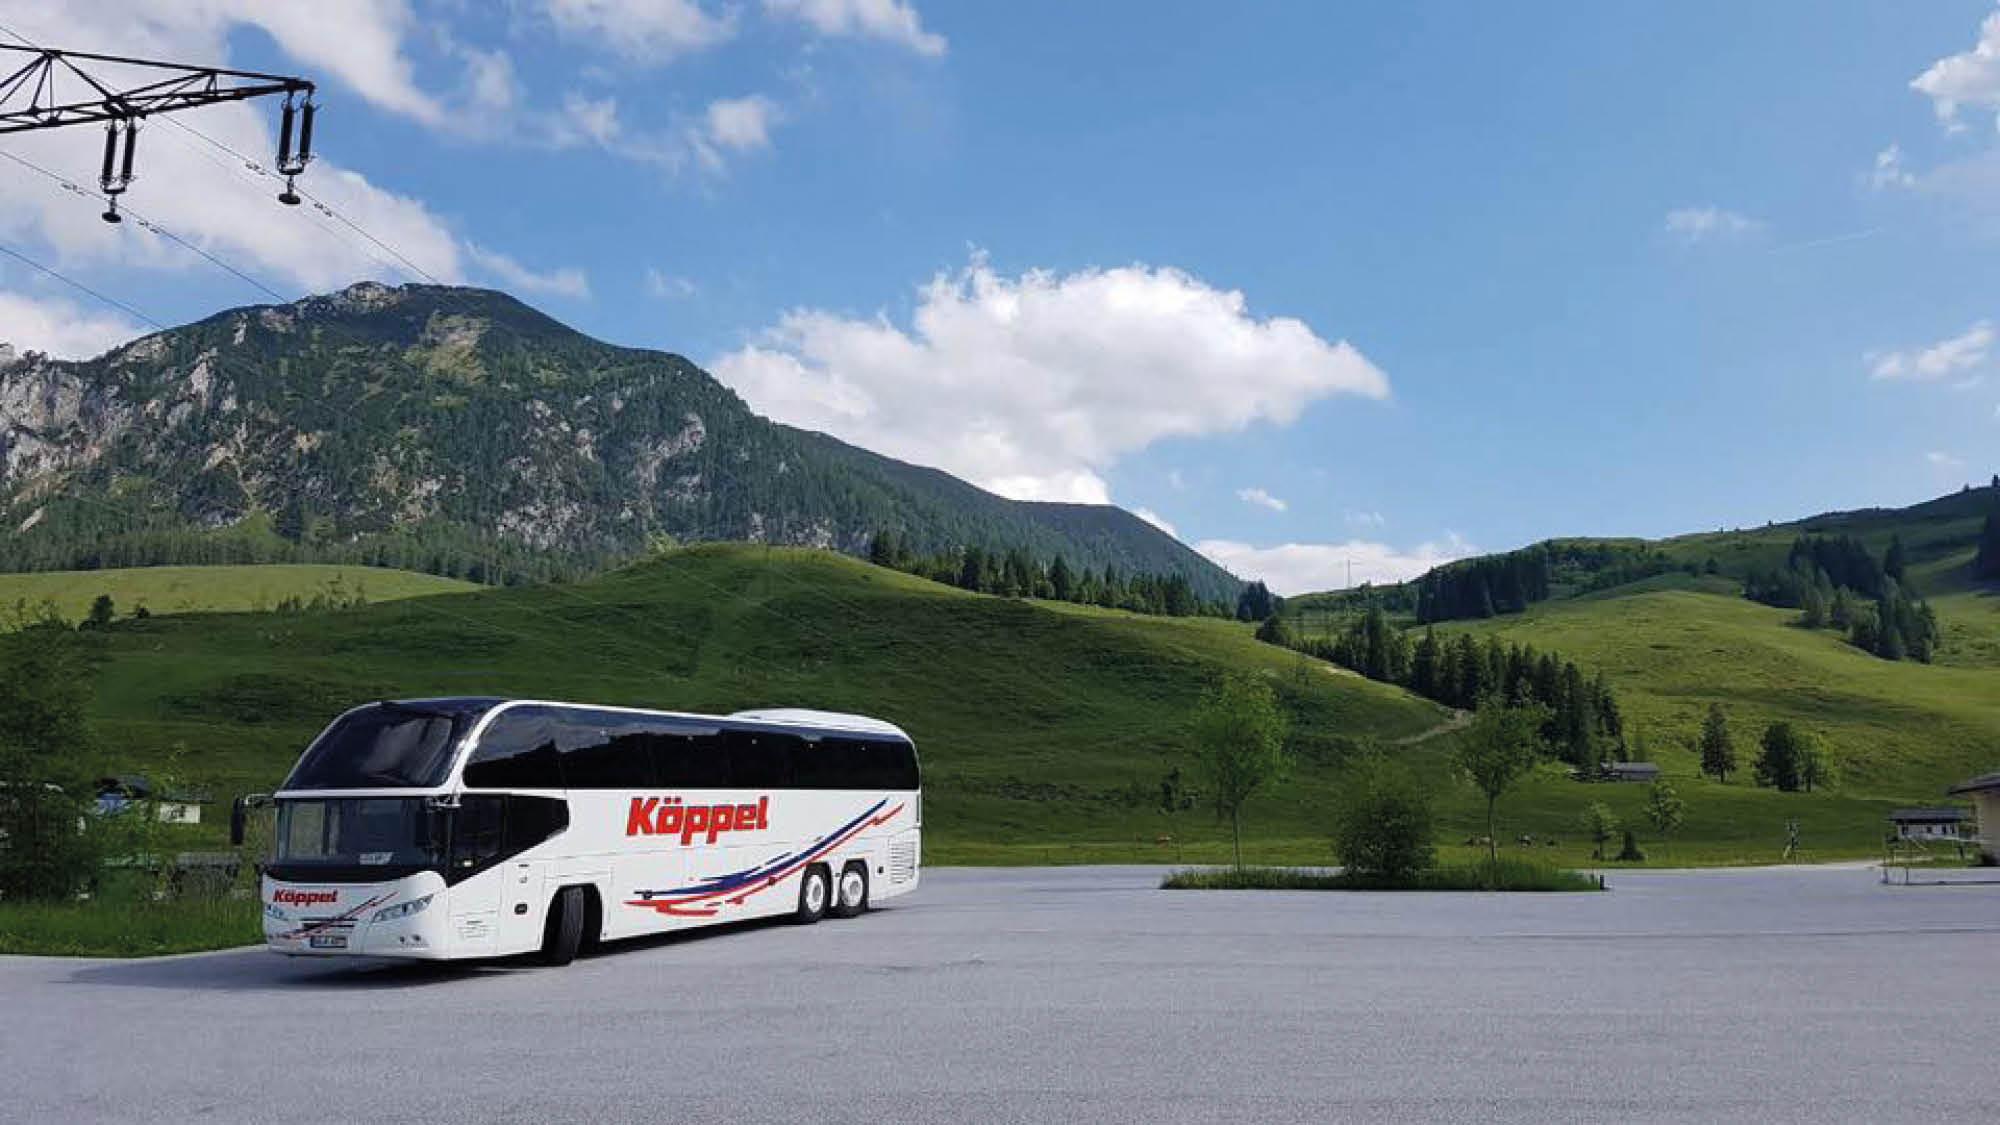 Köppel - Ellwangen - Website - Bus - 2019-12 - 09